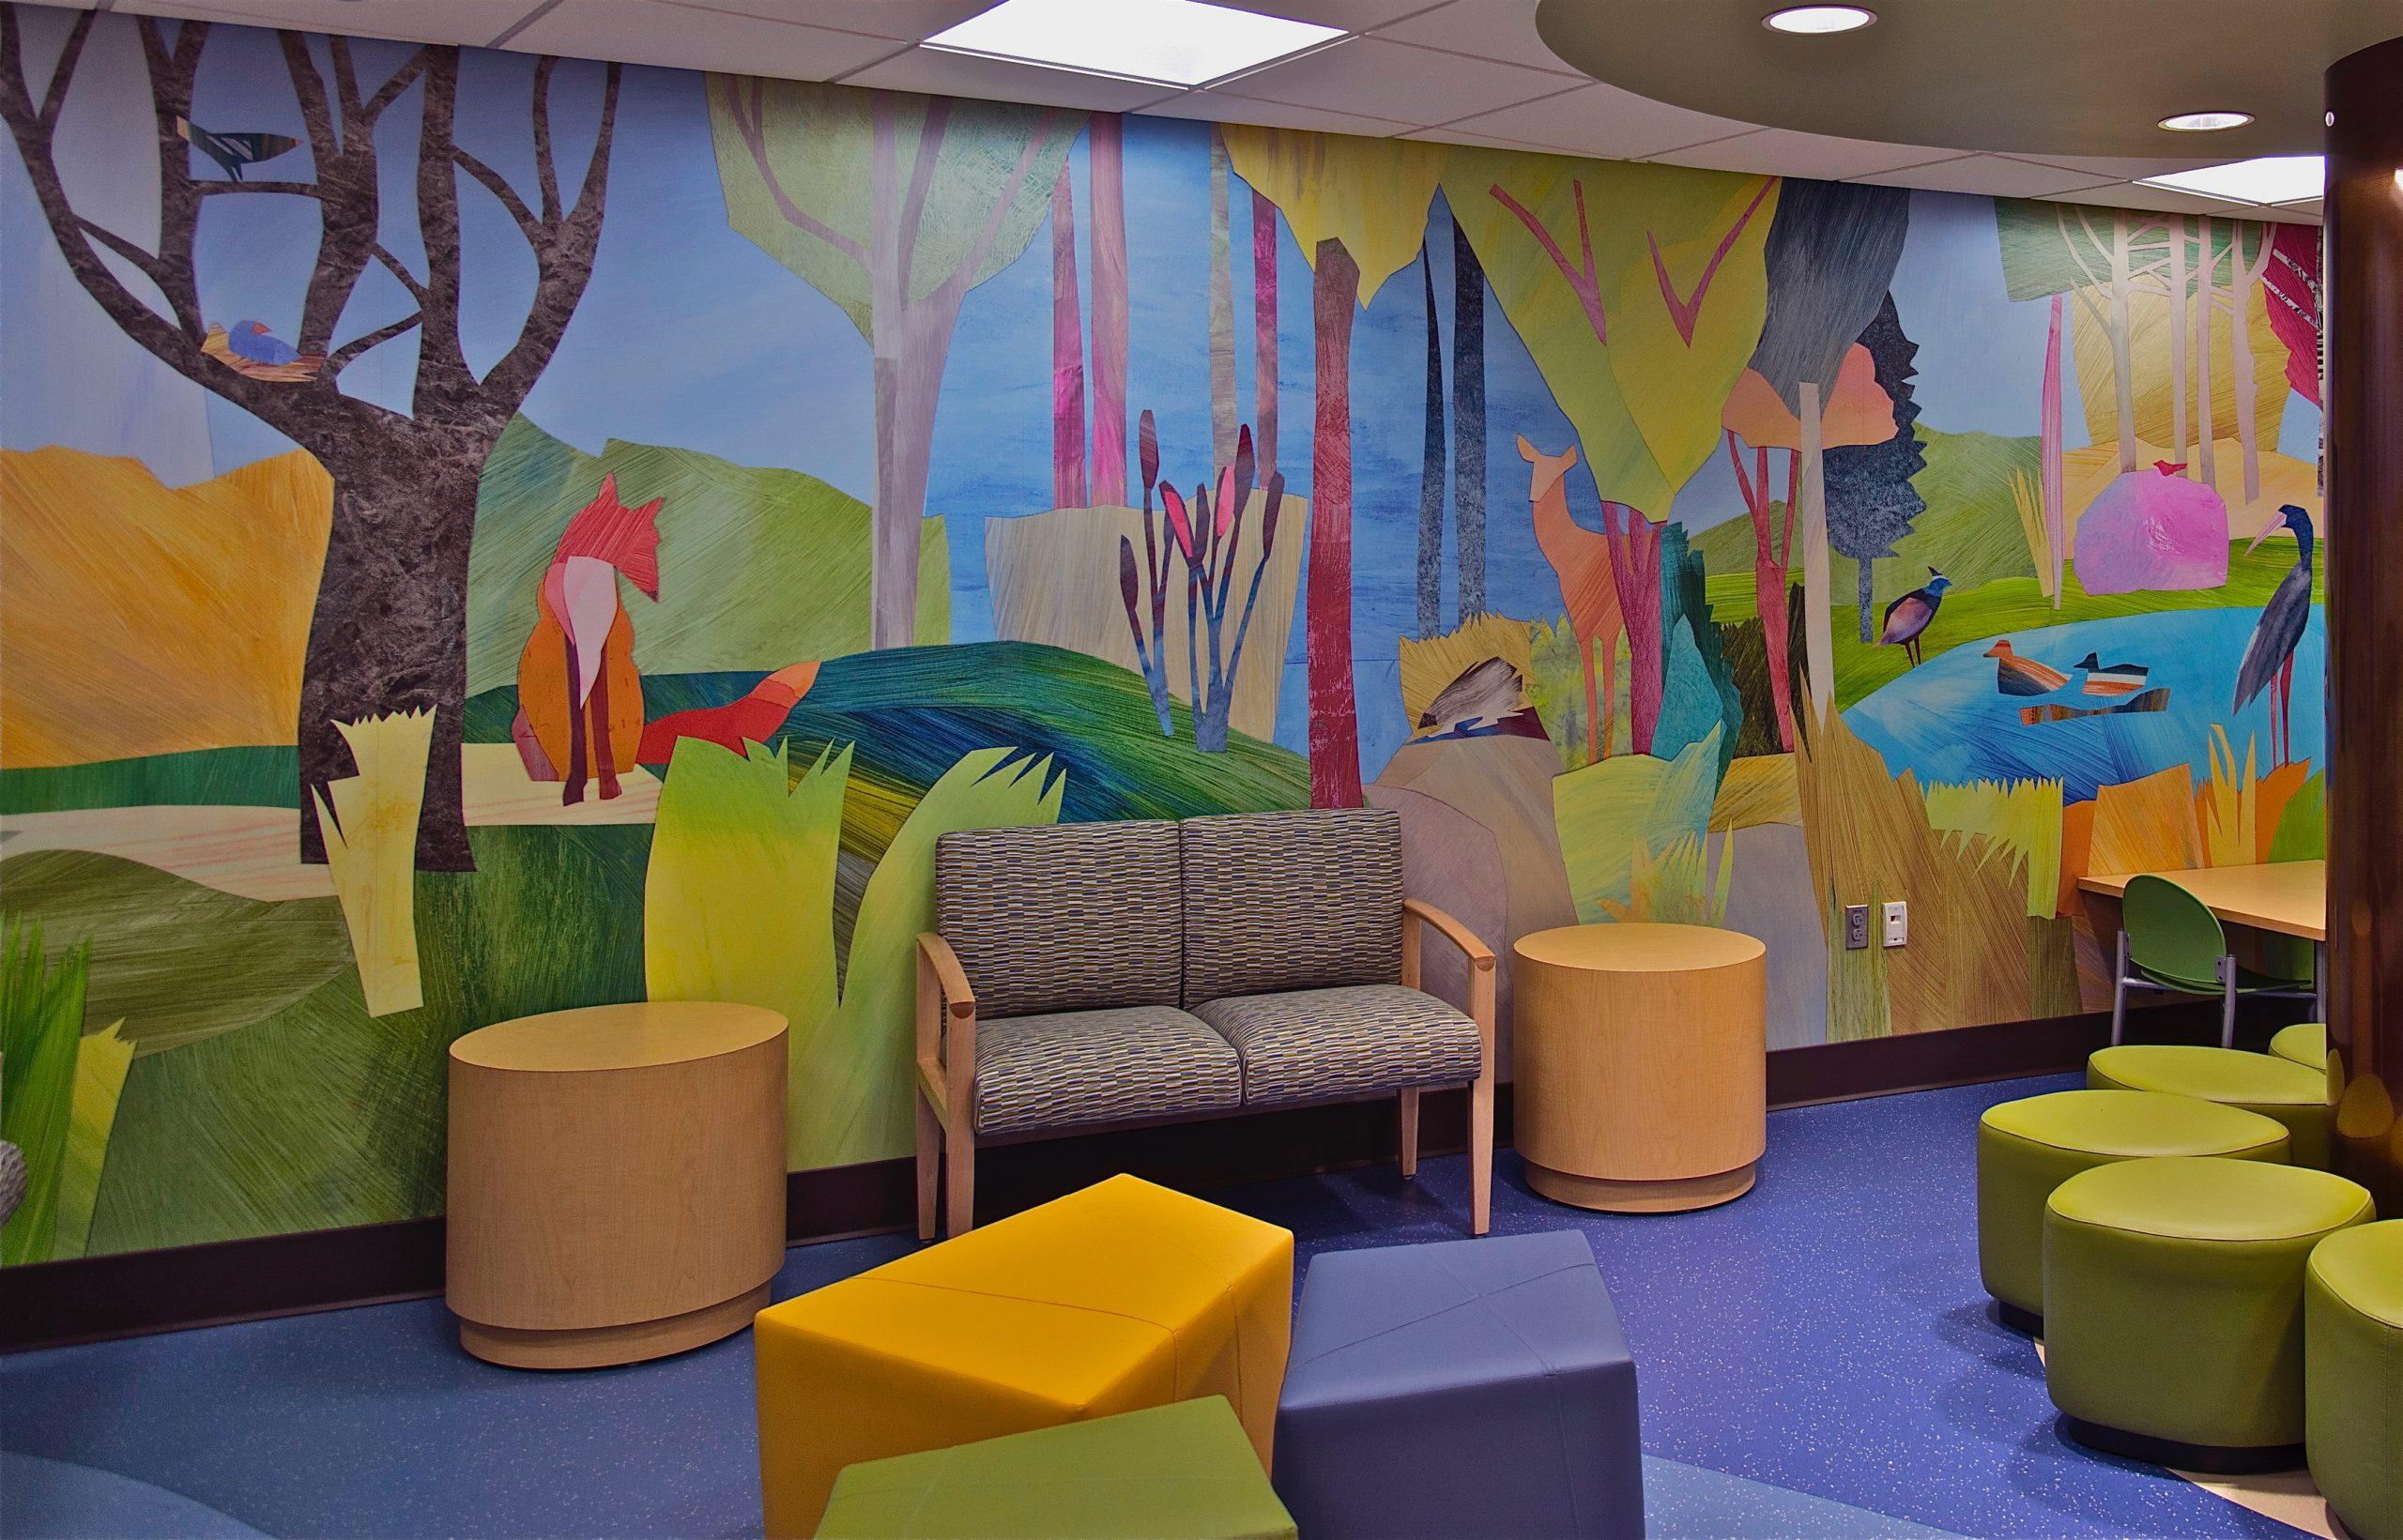 Dallas Children's Medical Center